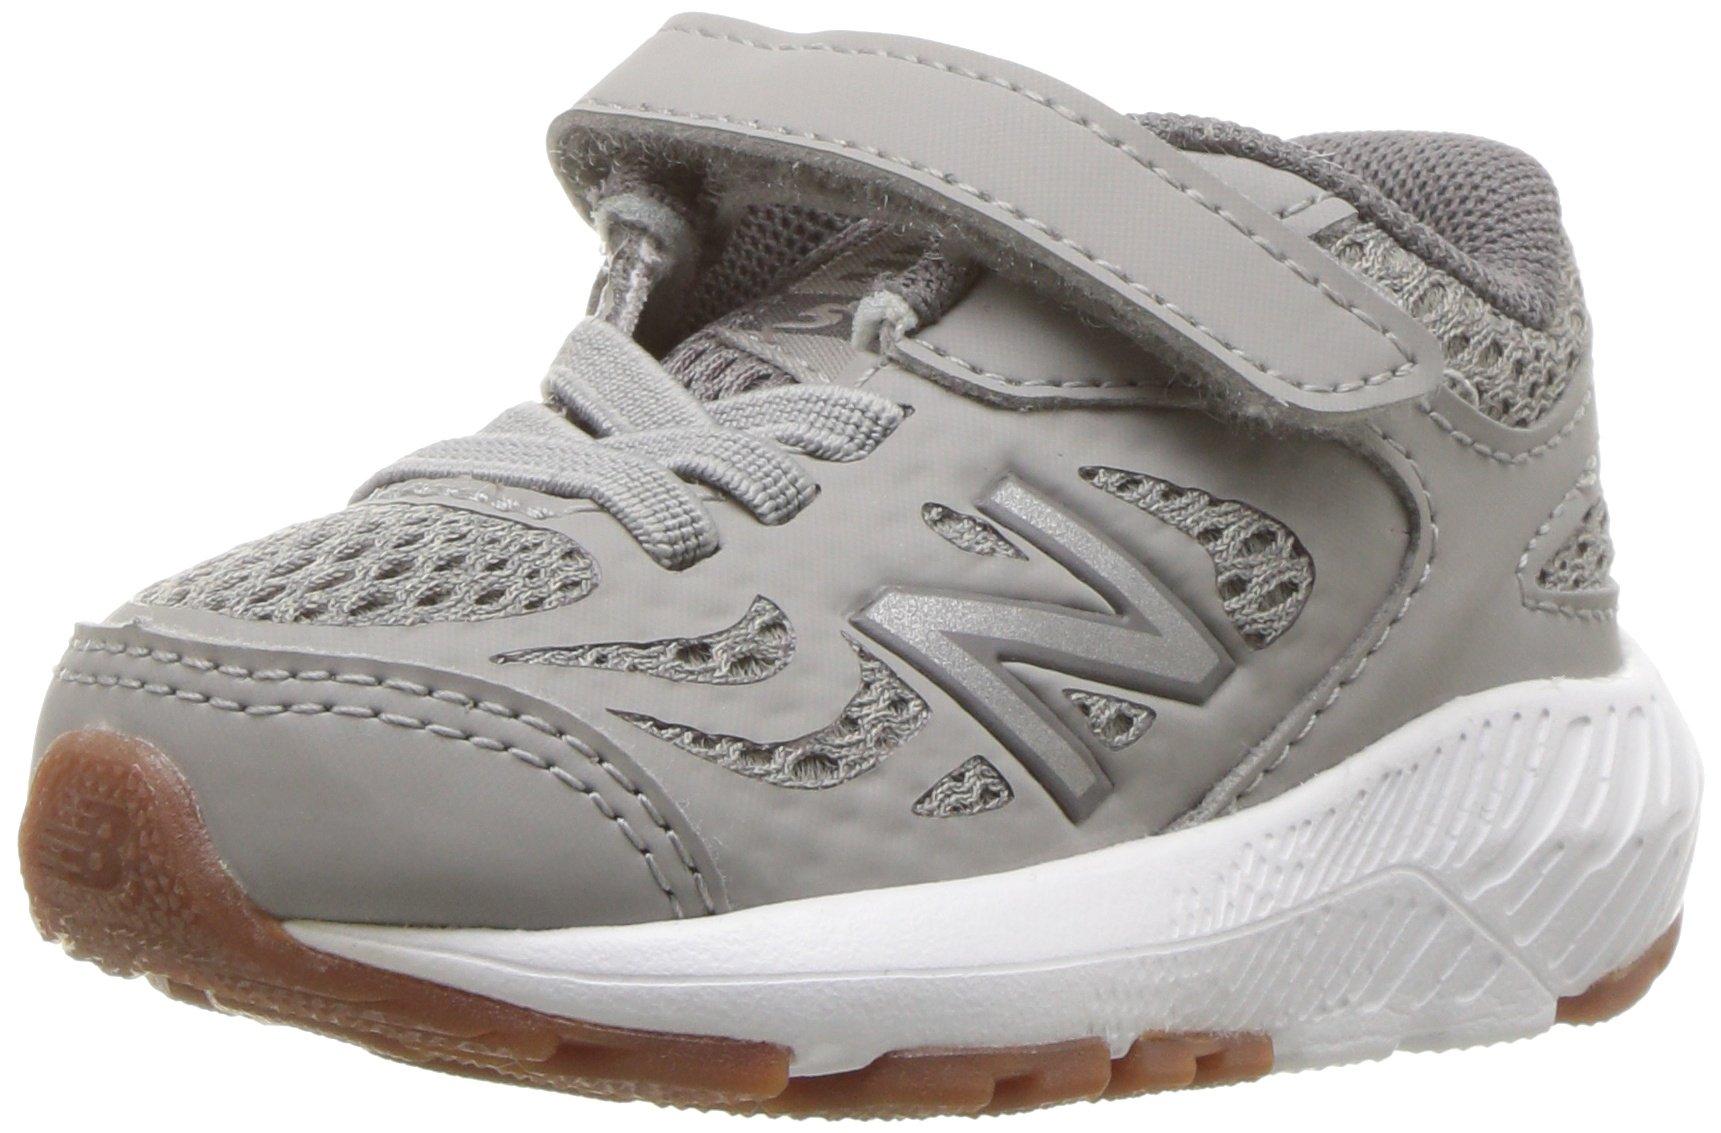 New Balance Boys' 519v1 Hook and Loop Running Shoe, Team Away Grey/Castlerock, 4 W US Toddler